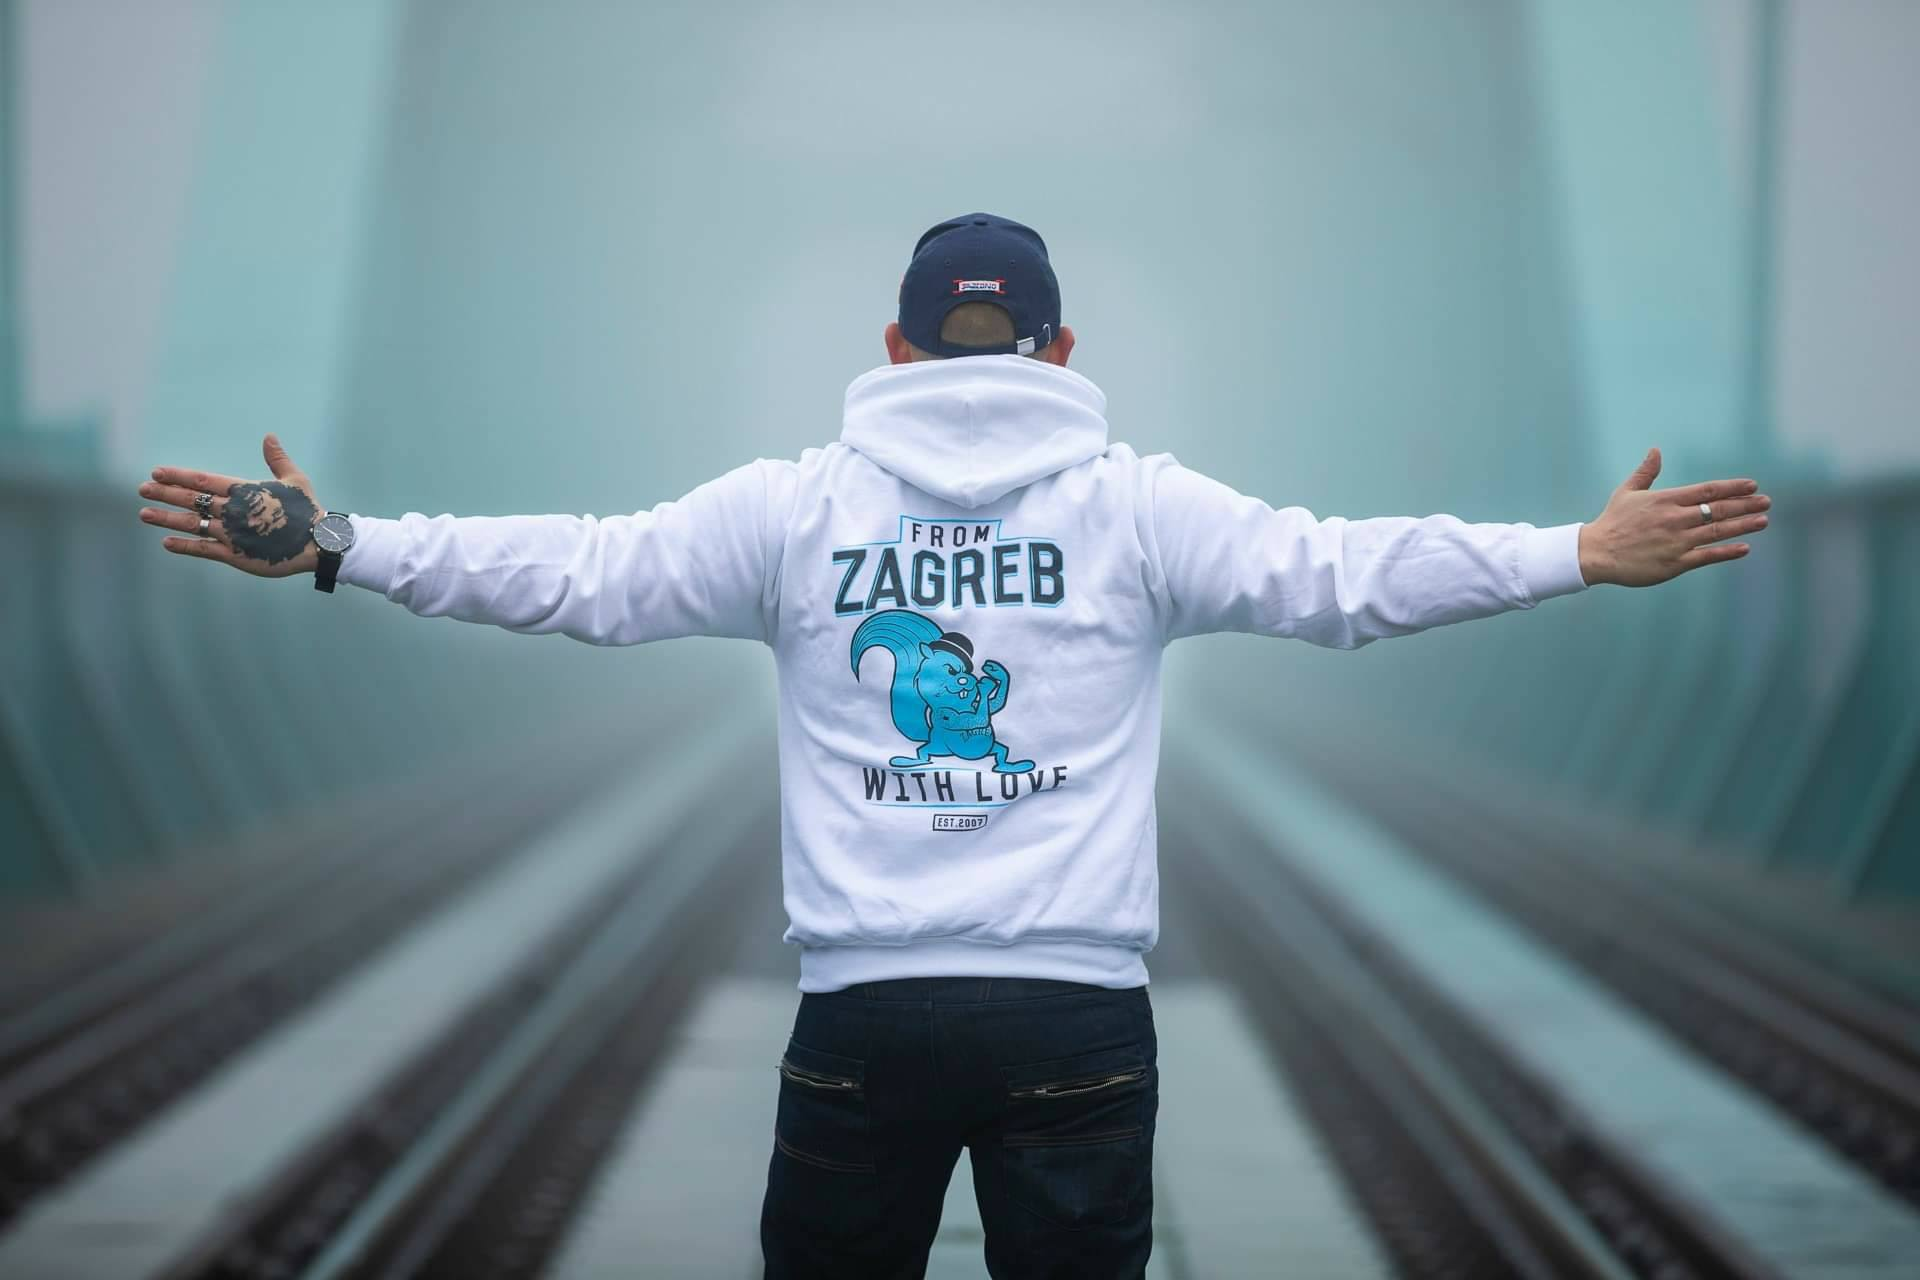 From Zagreb With Love: Ljubav prema rodnom gradu kao inspiracija za brend